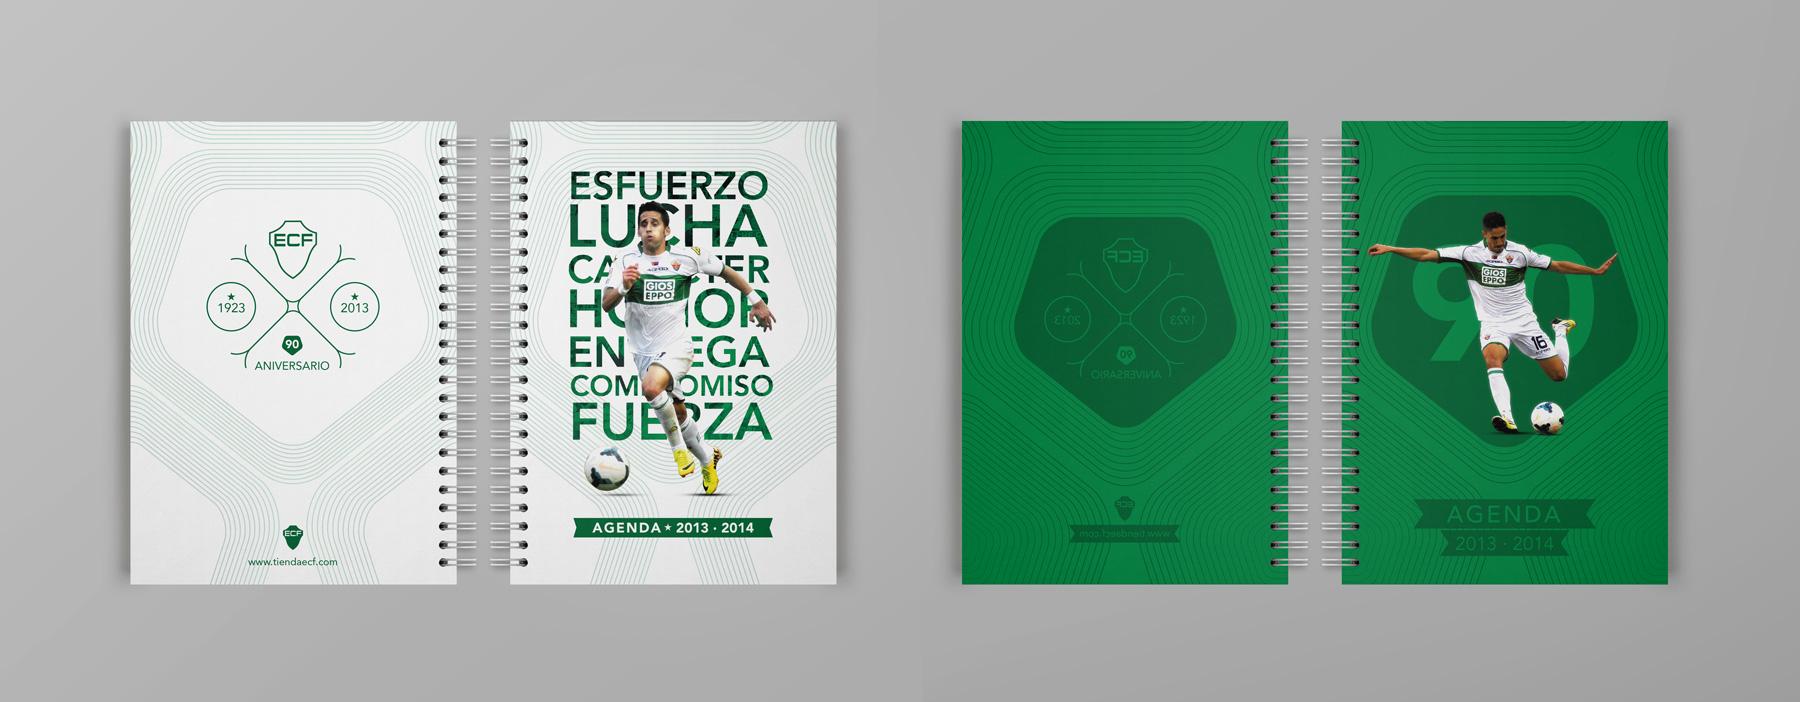 agenda-2-elche-cf